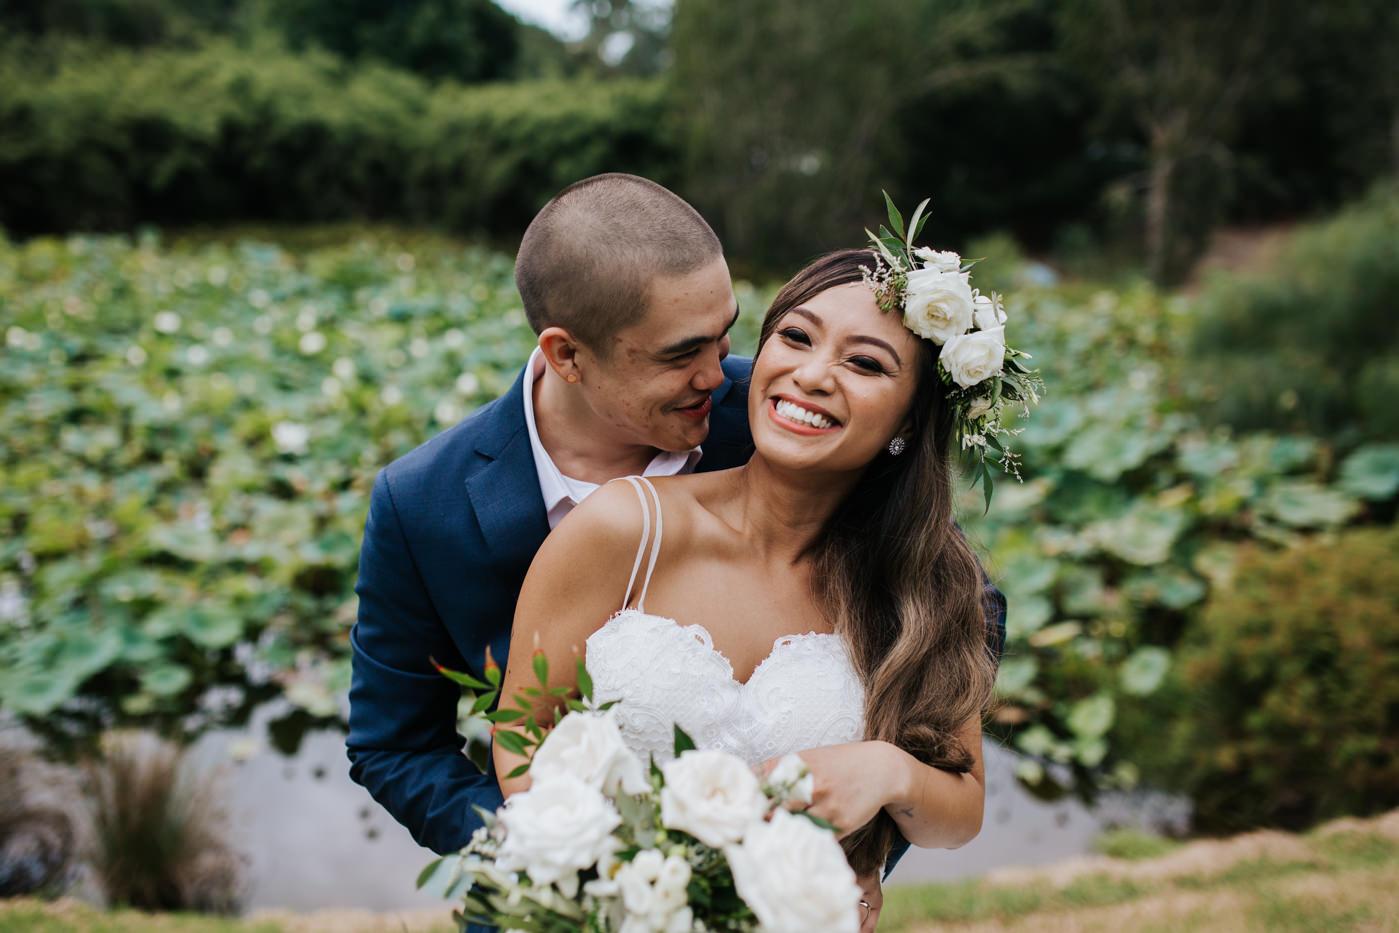 Nick & Vanezza - Fernbank Farm Wedding - Samantha Heather Photography-85.jpg